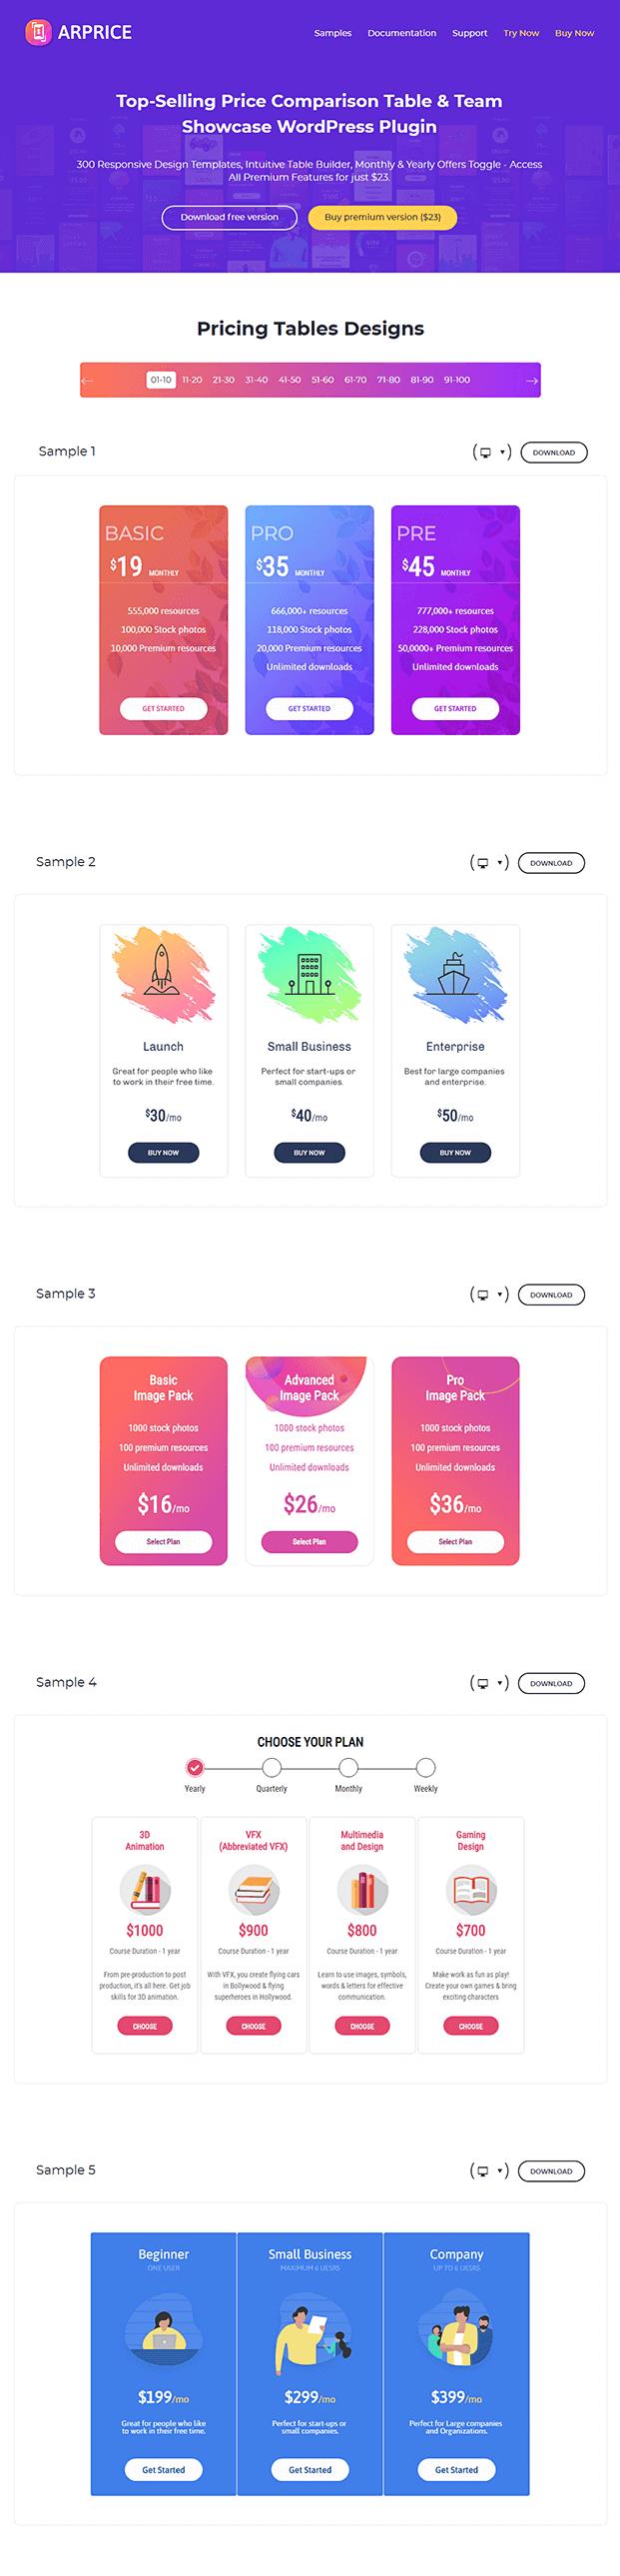 Pricing Table WordPress Plugin - Pricing Table Designs